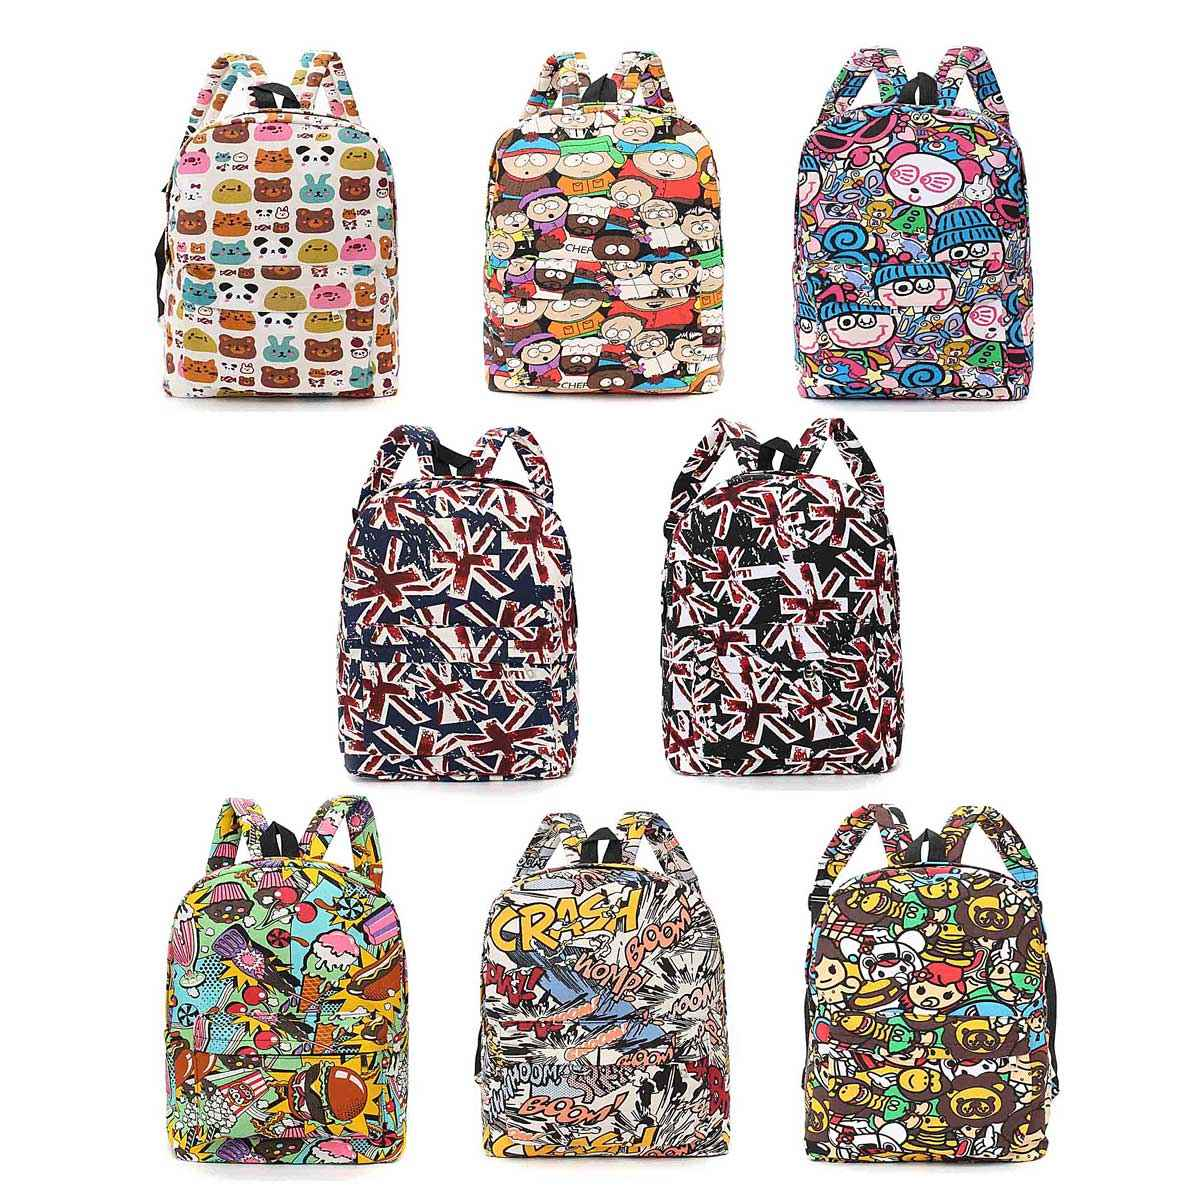 bolsa de escola mochilas de Size : 30cm X 43cm X 8cm